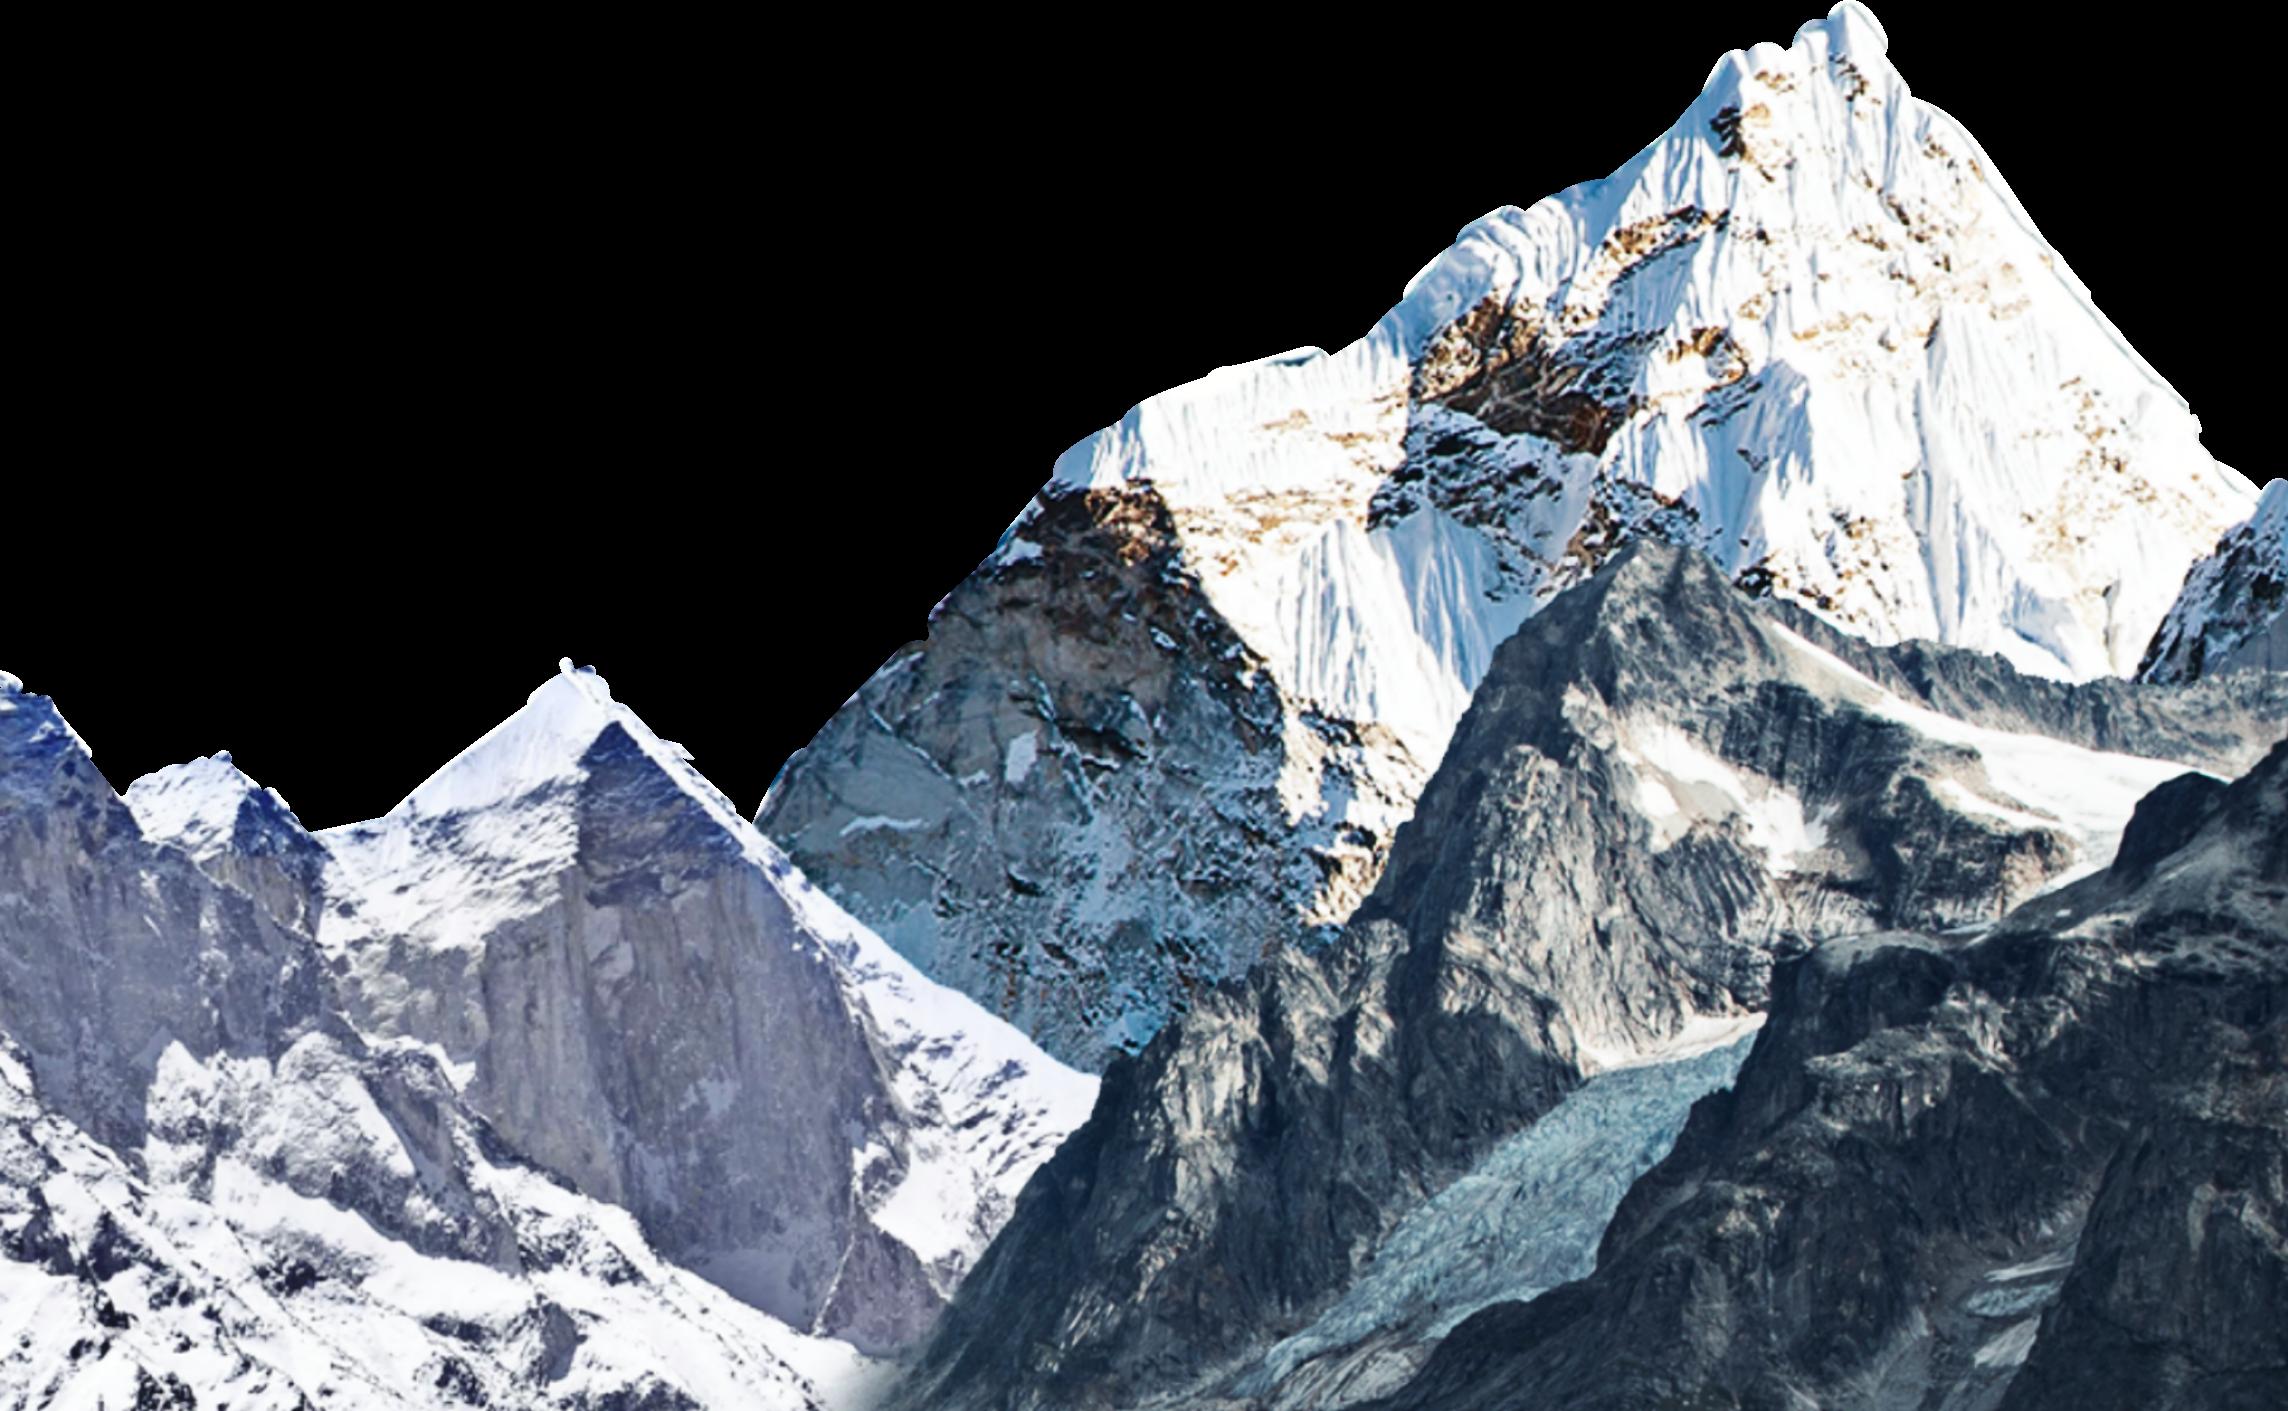 mountains mountain snow ftestickers nature...